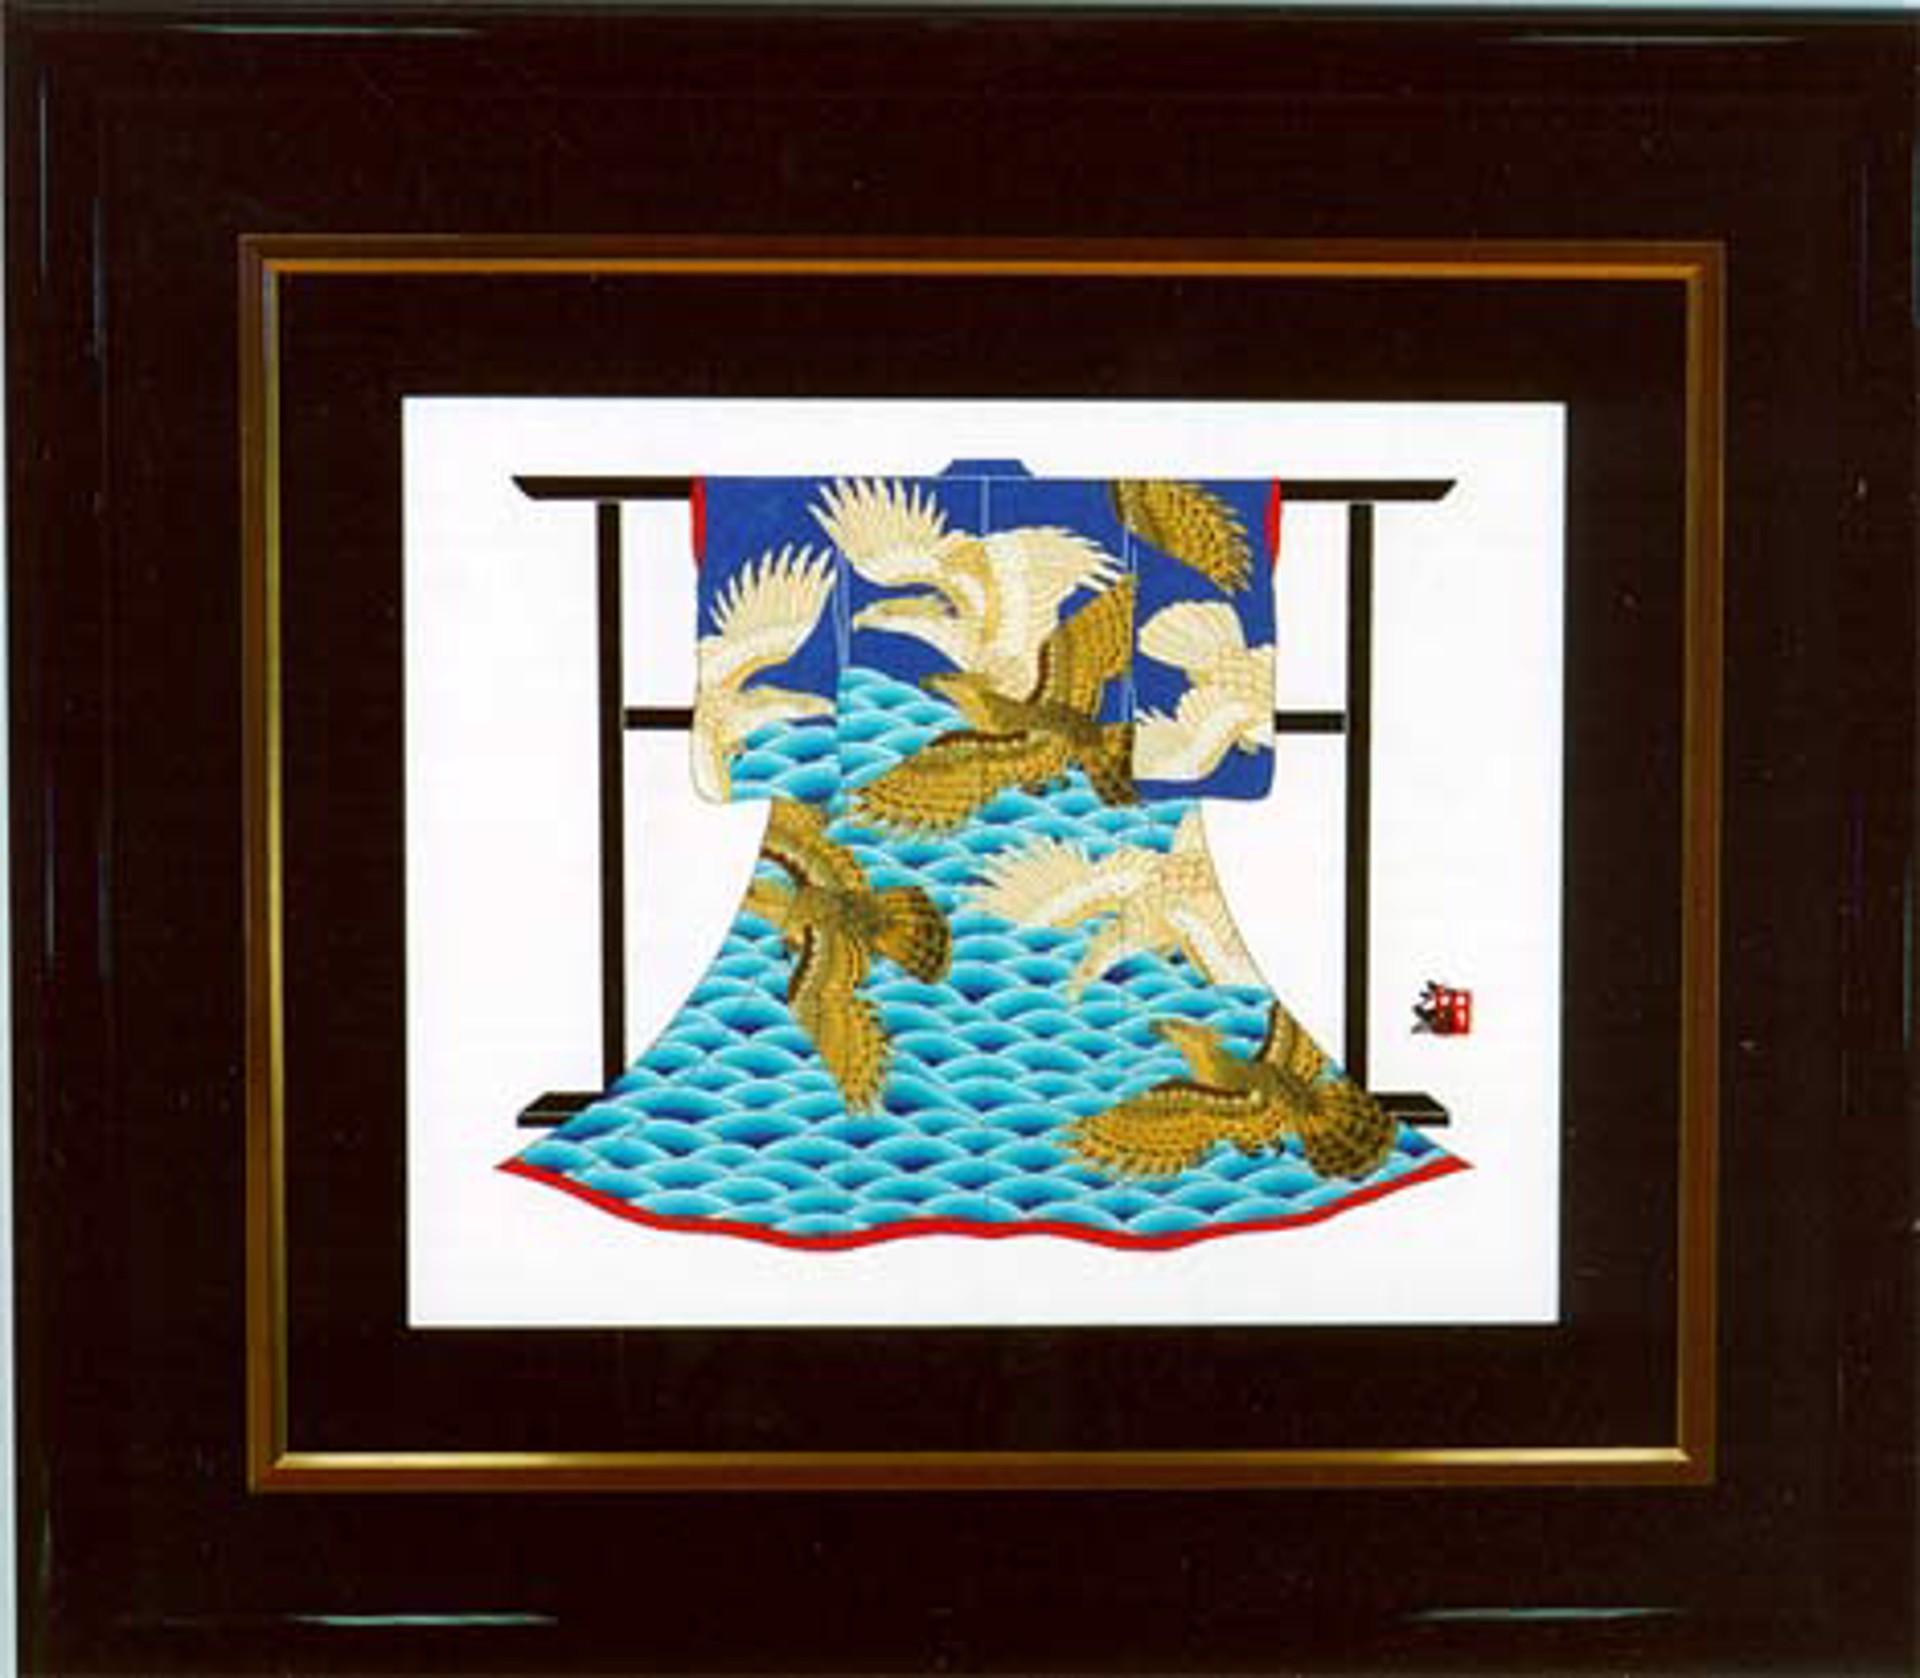 Wave With Hawk by Hisashi Otsuka